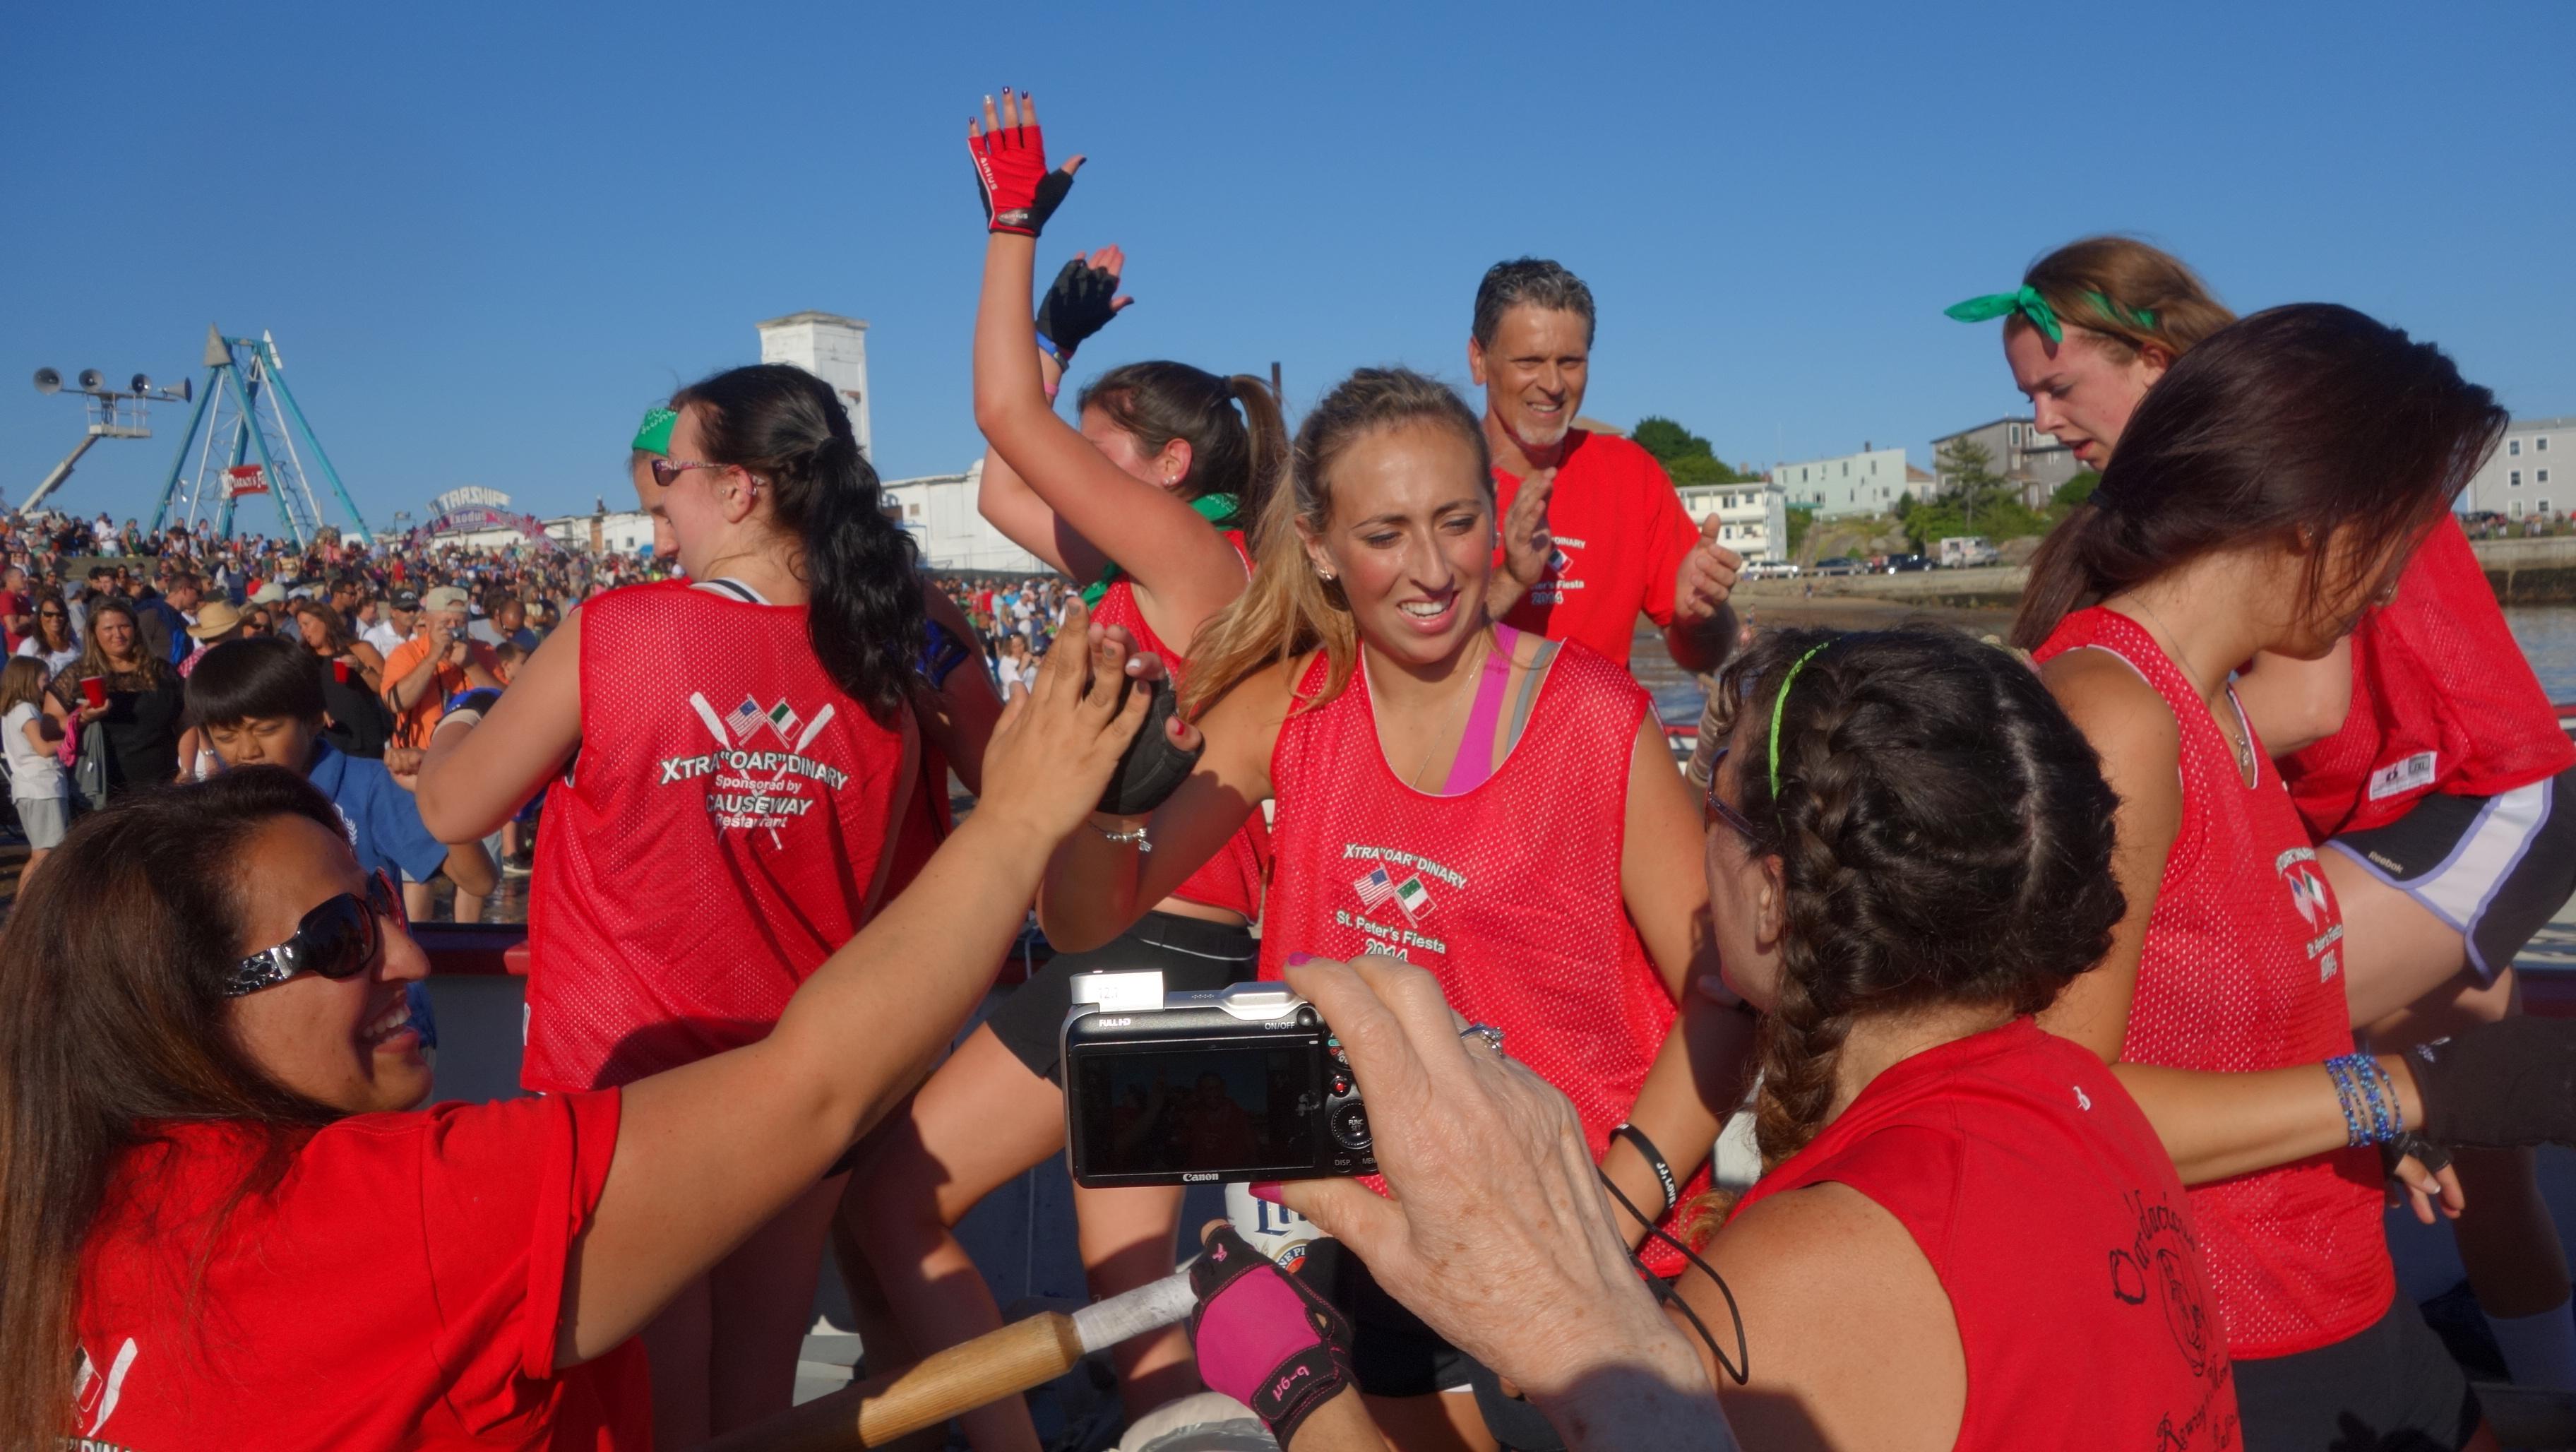 Amanda Race St. Peter's Fiesta 2014 Camps! 220